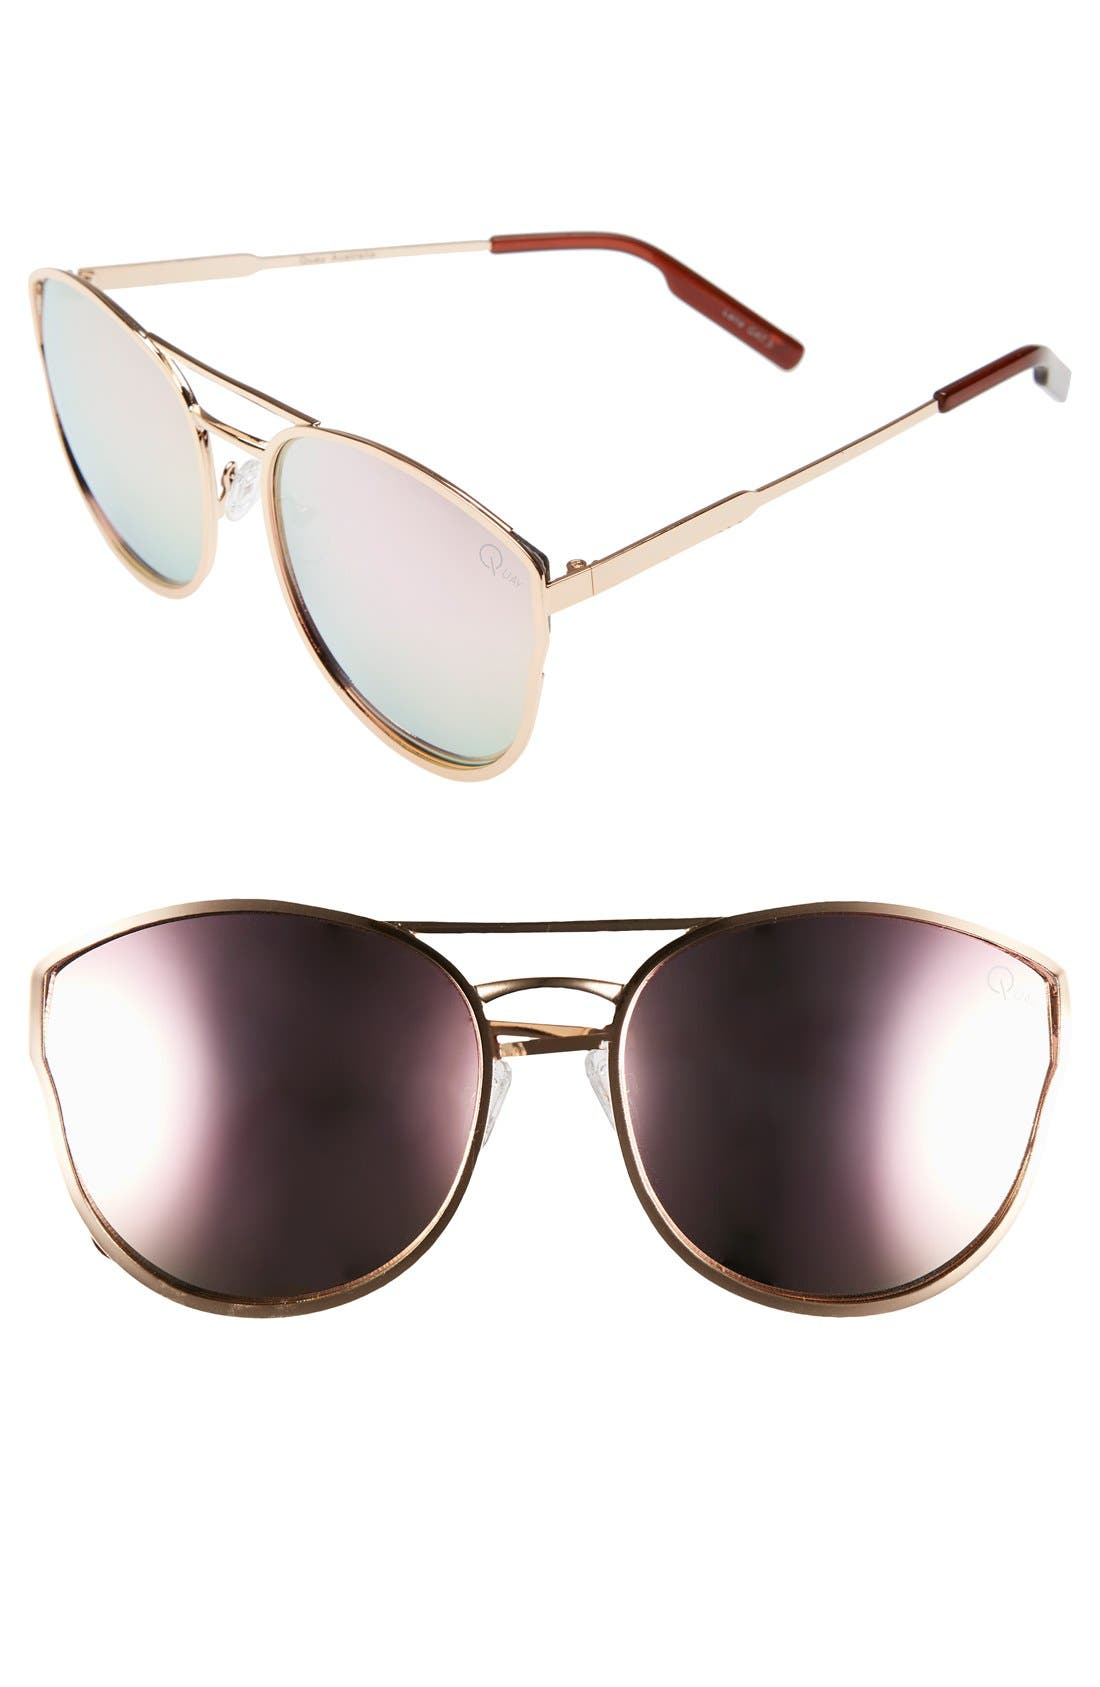 QUAY AUSTRALIA Cherry Bomb 60mm Sunglasses, Main, color, 690